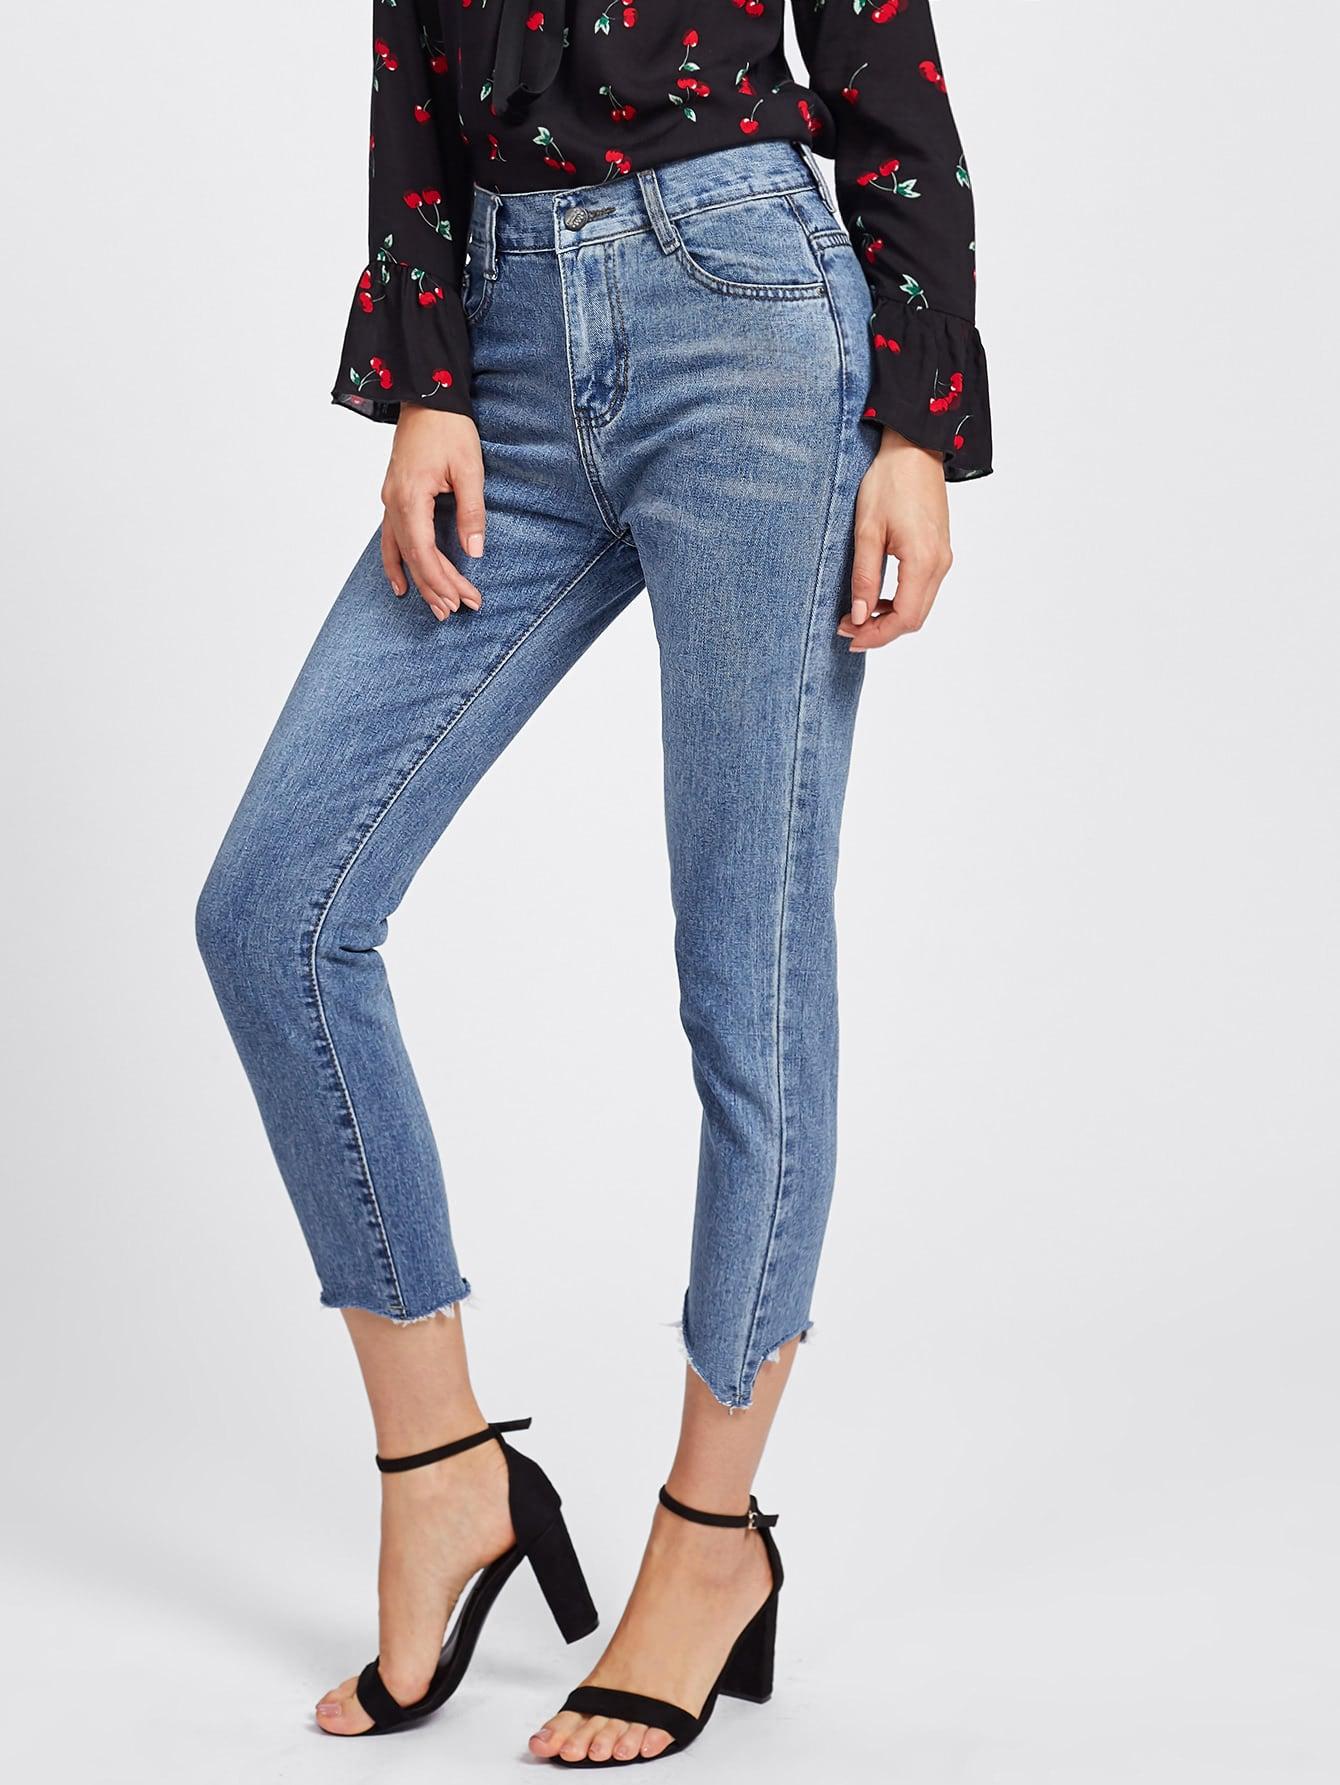 Asymmetric Raw Hem Capri Jeans